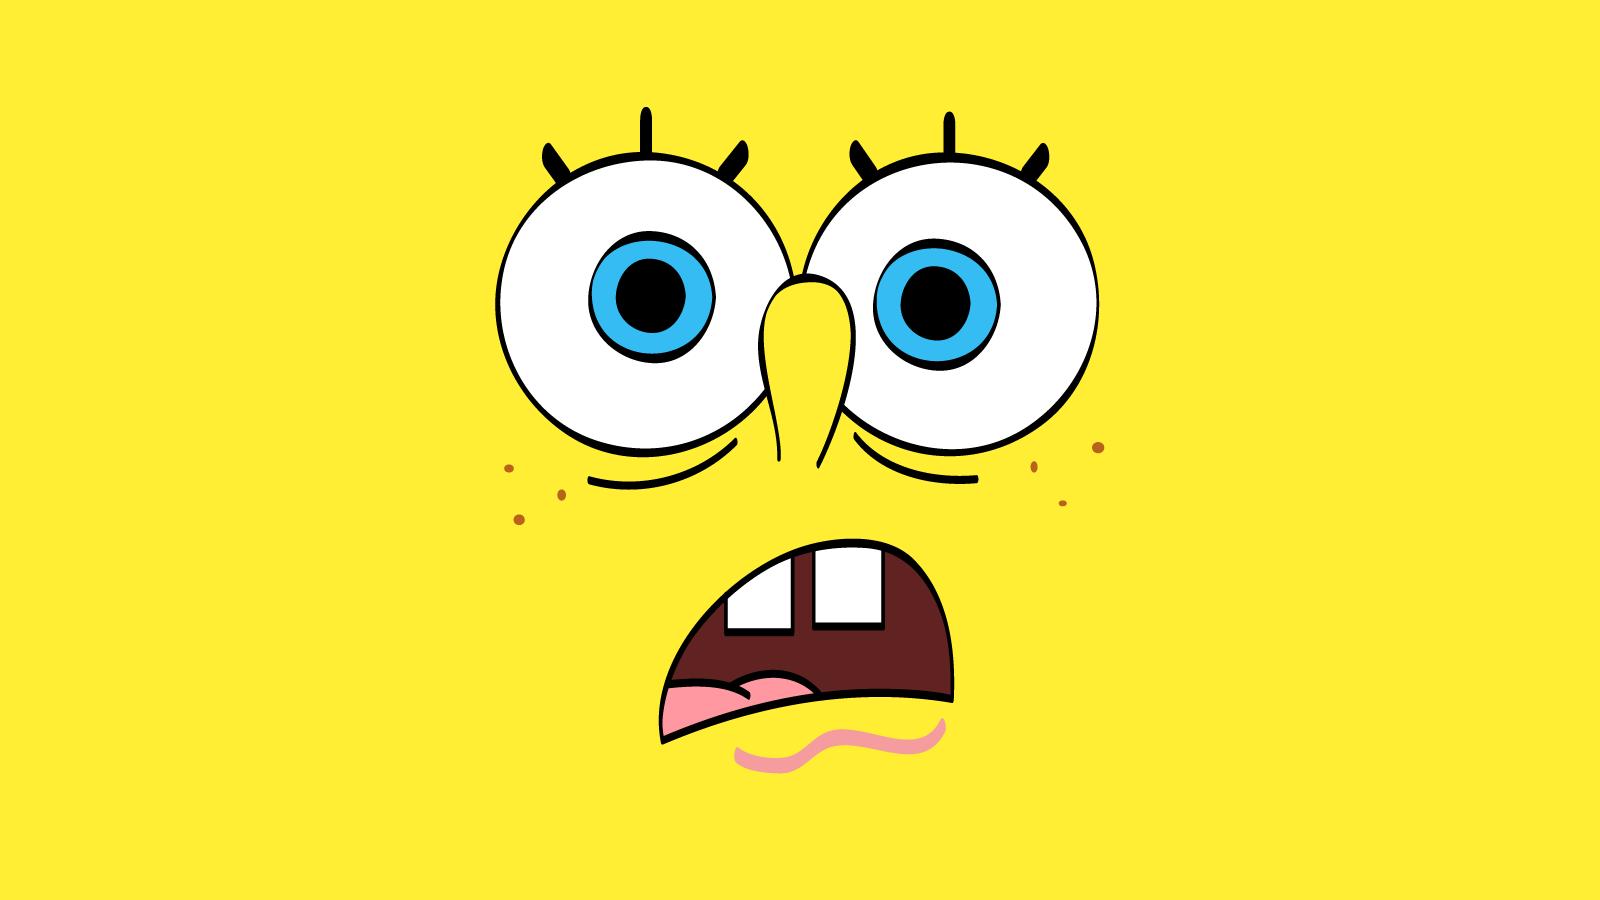 Funny Spongebob Face Hd Wallpapers Backgrounds Ibackgroundzcom 1600x900